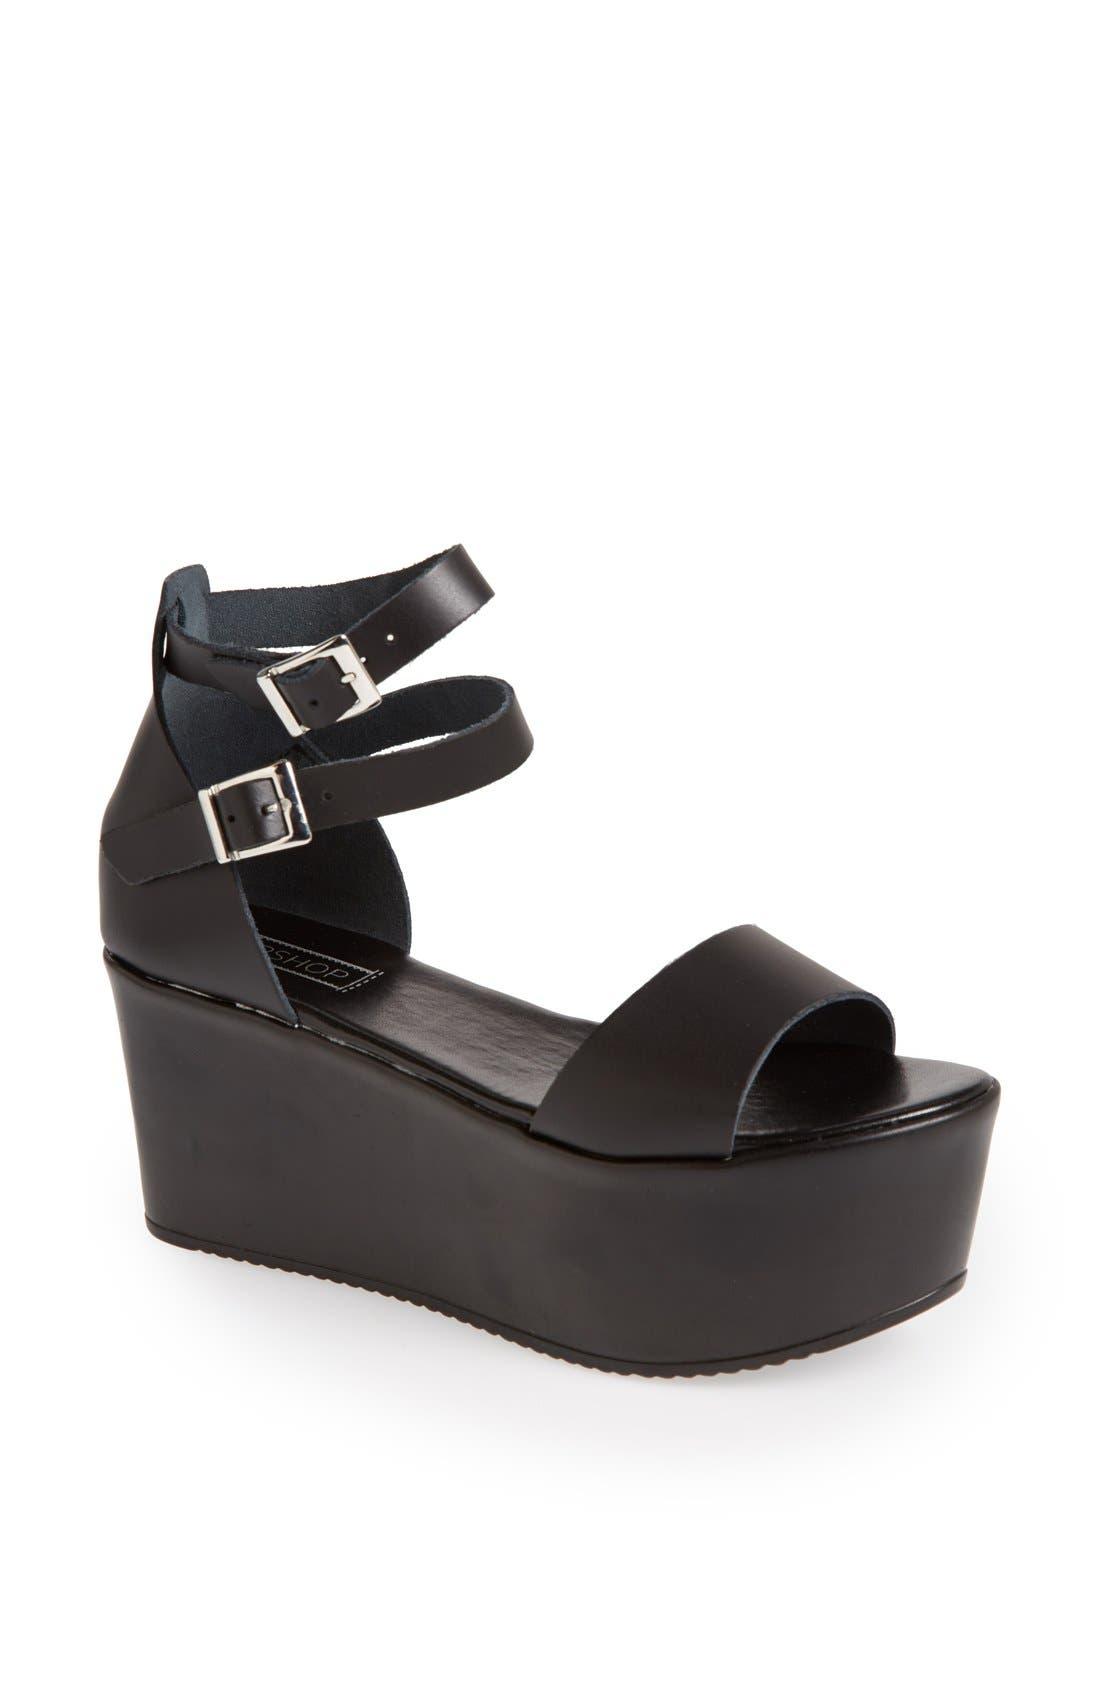 TOPSHOP 'Wallis' Ankle Strap Platform Sandal, Main, color, 001